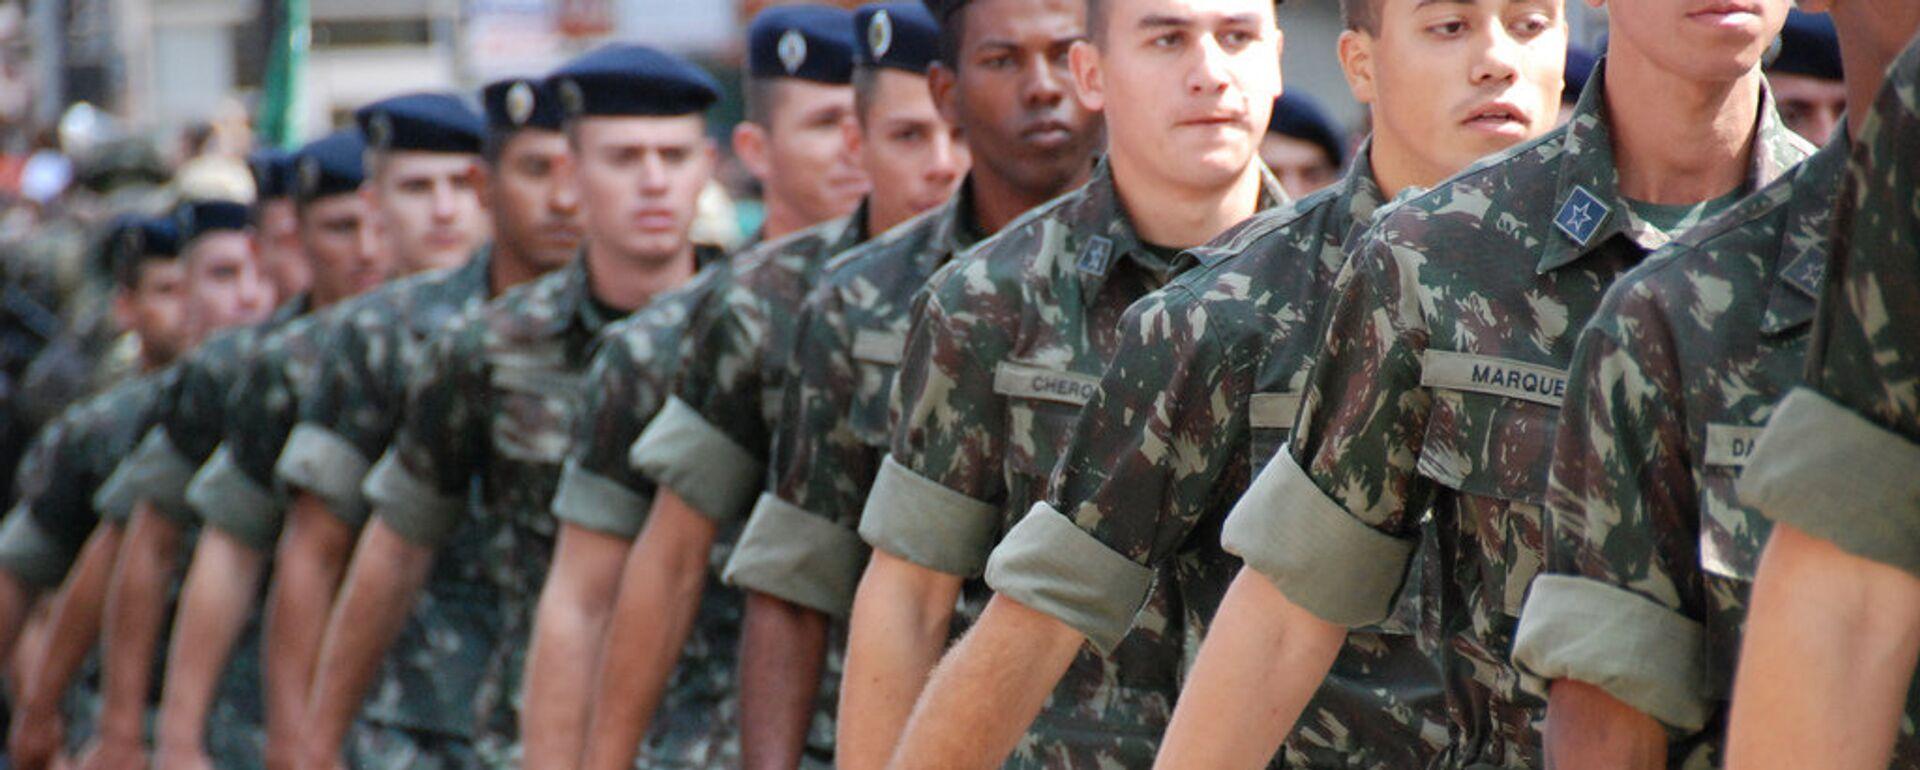 Desfile del Ejército de Brasil  - Sputnik Mundo, 1920, 17.08.2021